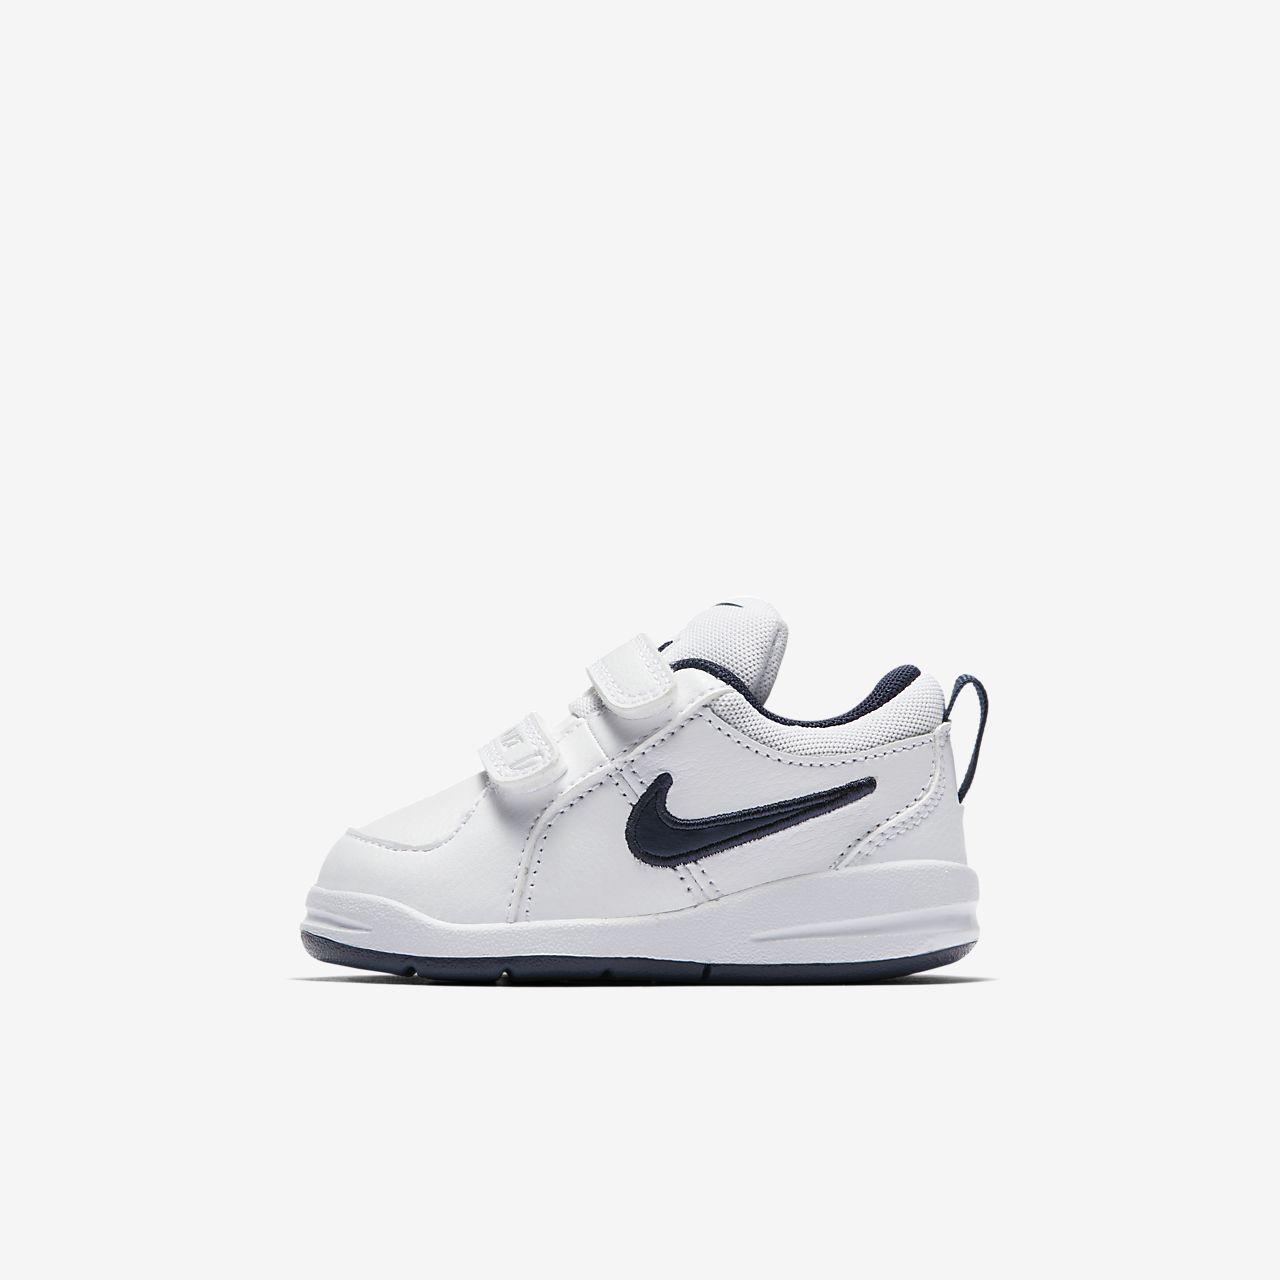 Nike Pico 4 Schoen baby's/peuters